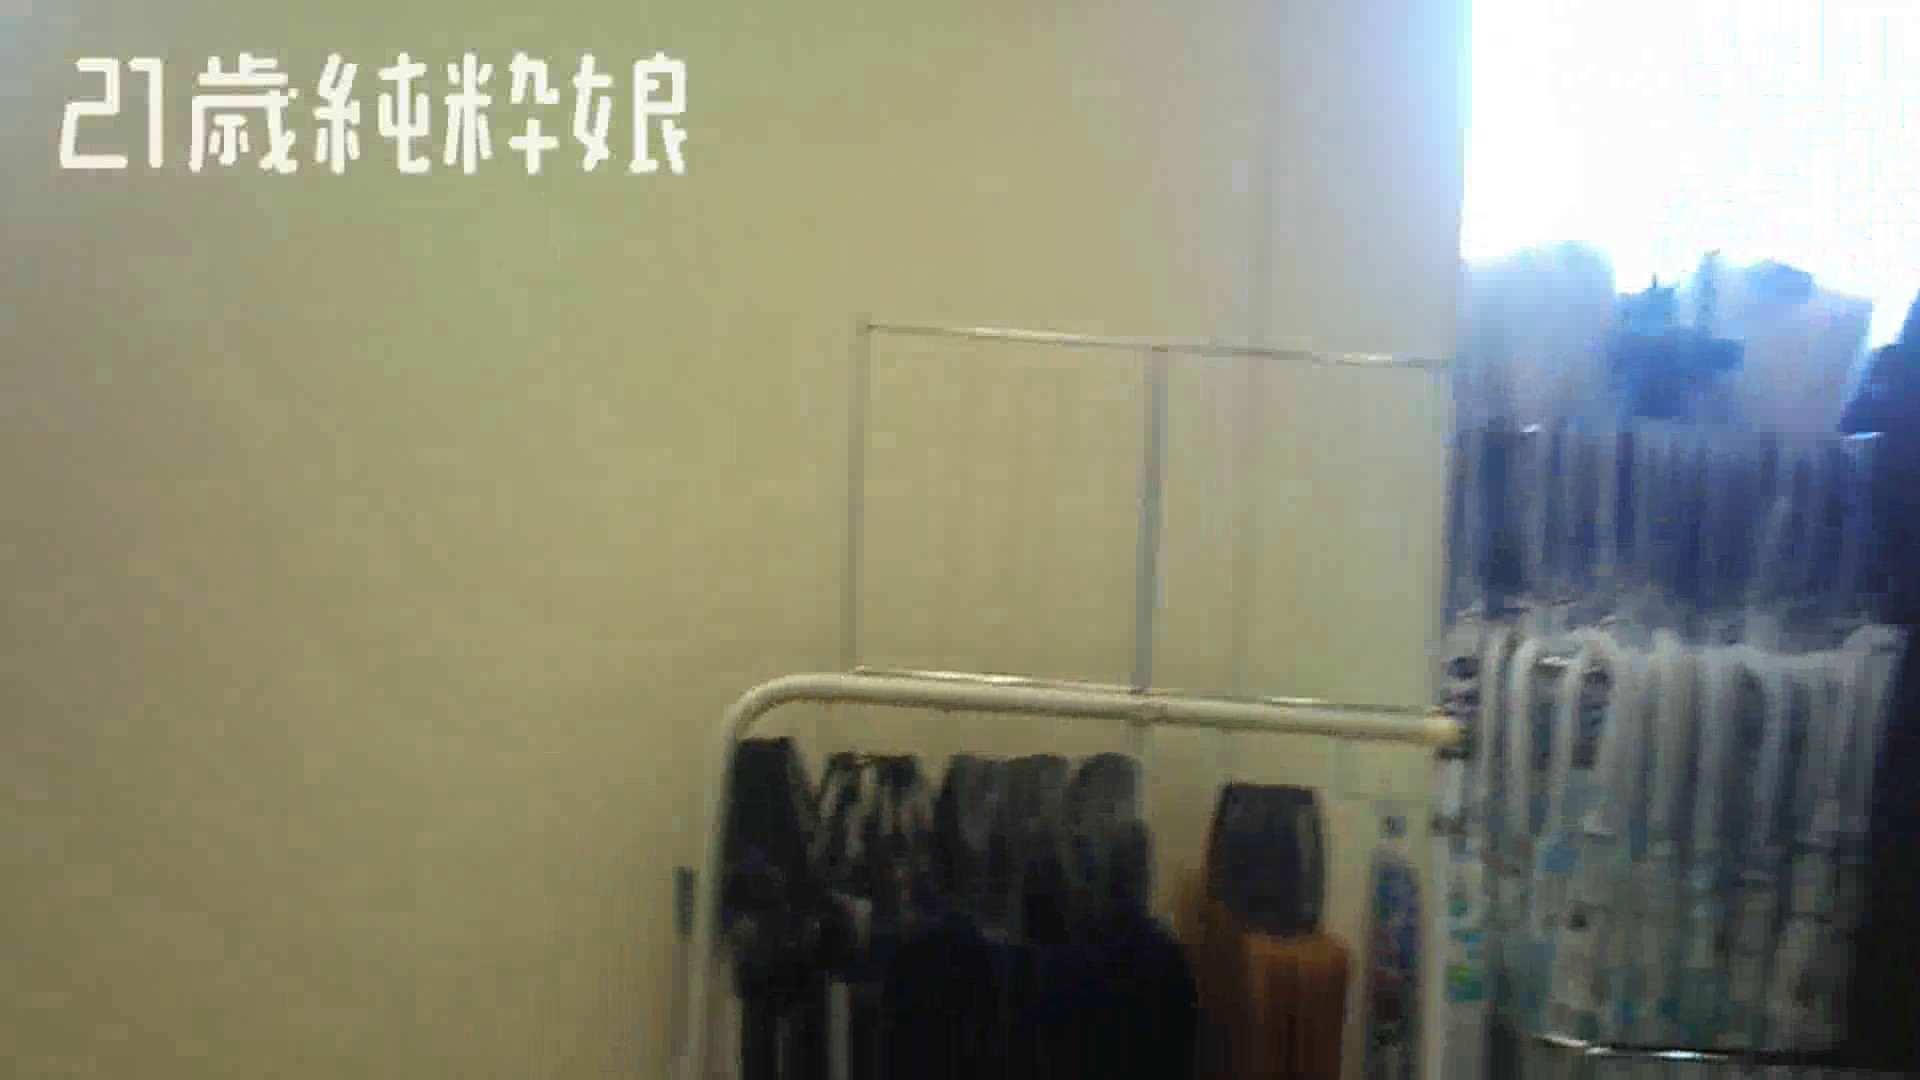 Gカップ21歳純粋嬢第2弾Vol.5 学校 オメコ動画キャプチャ 77pic 11